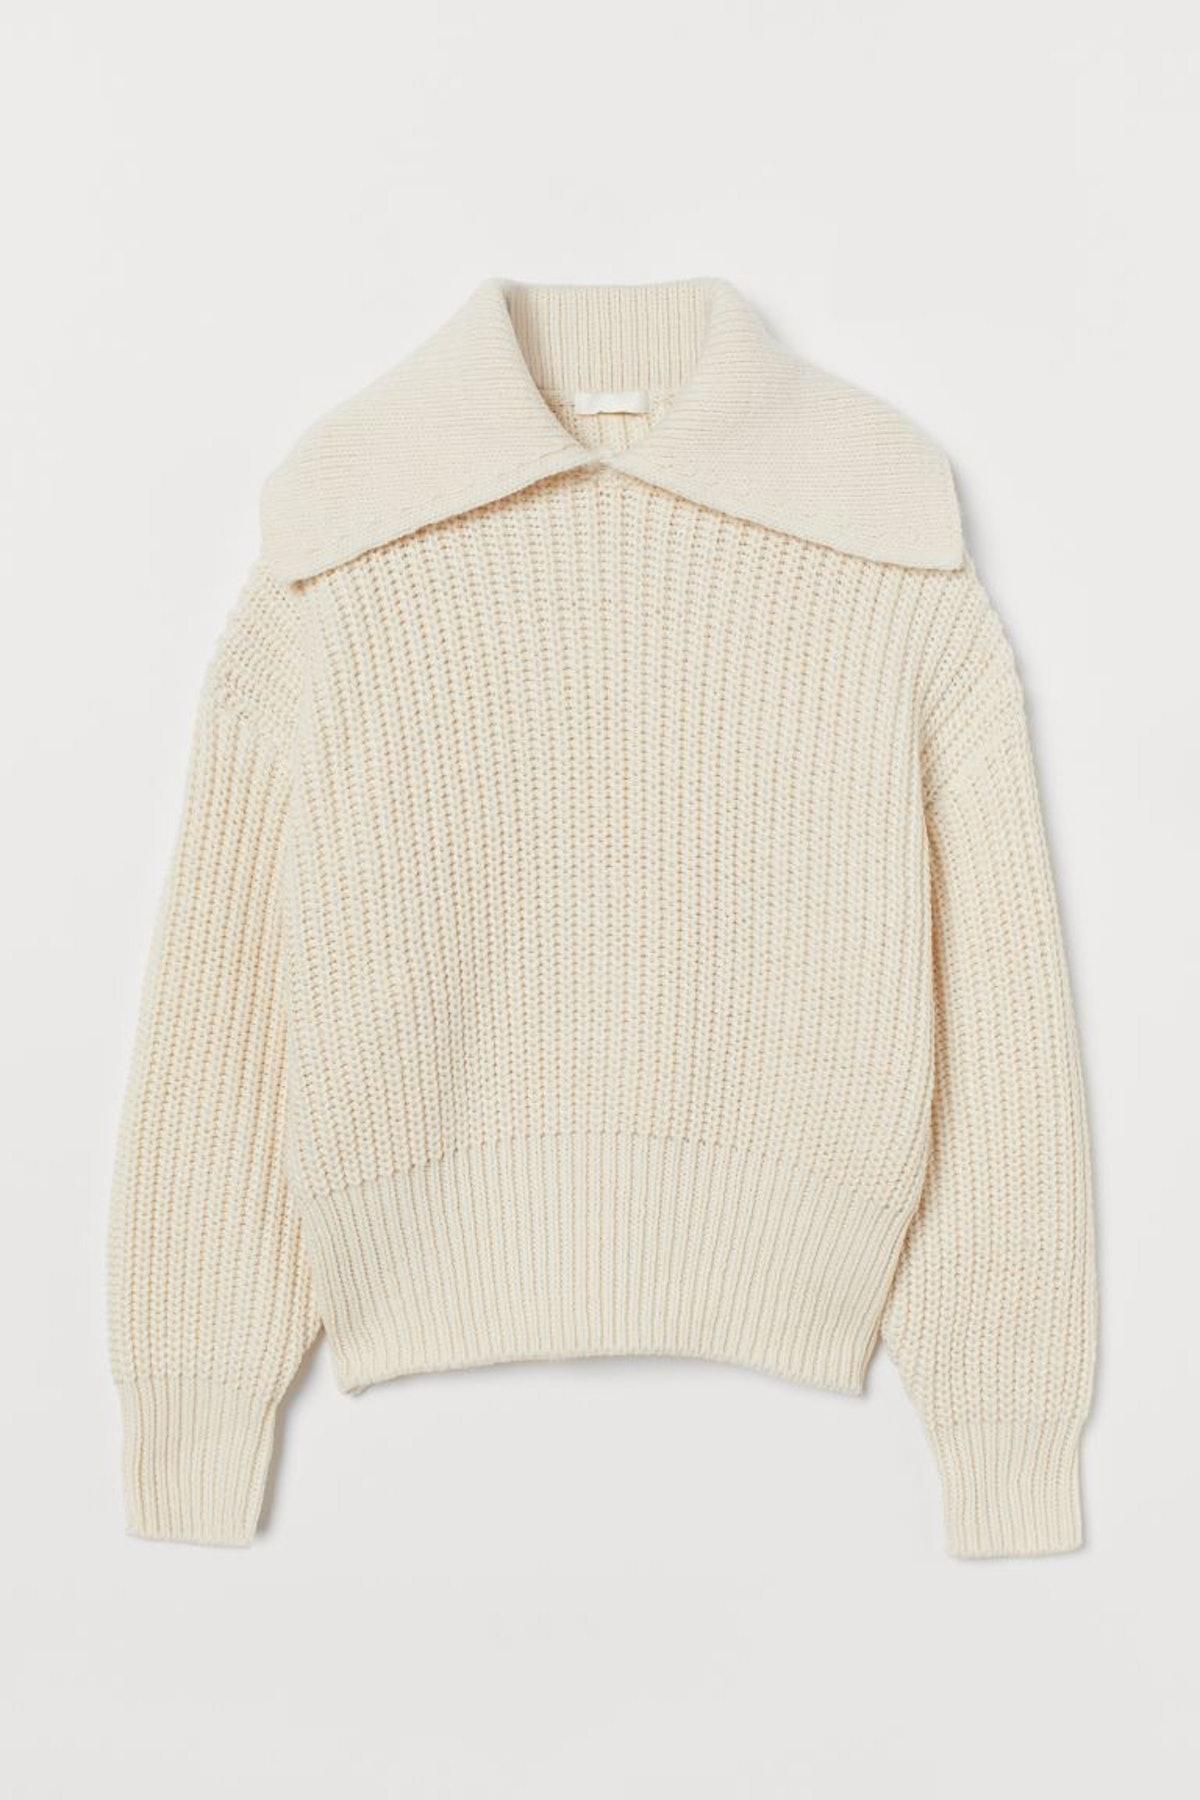 Collared Rib-knit Sweater